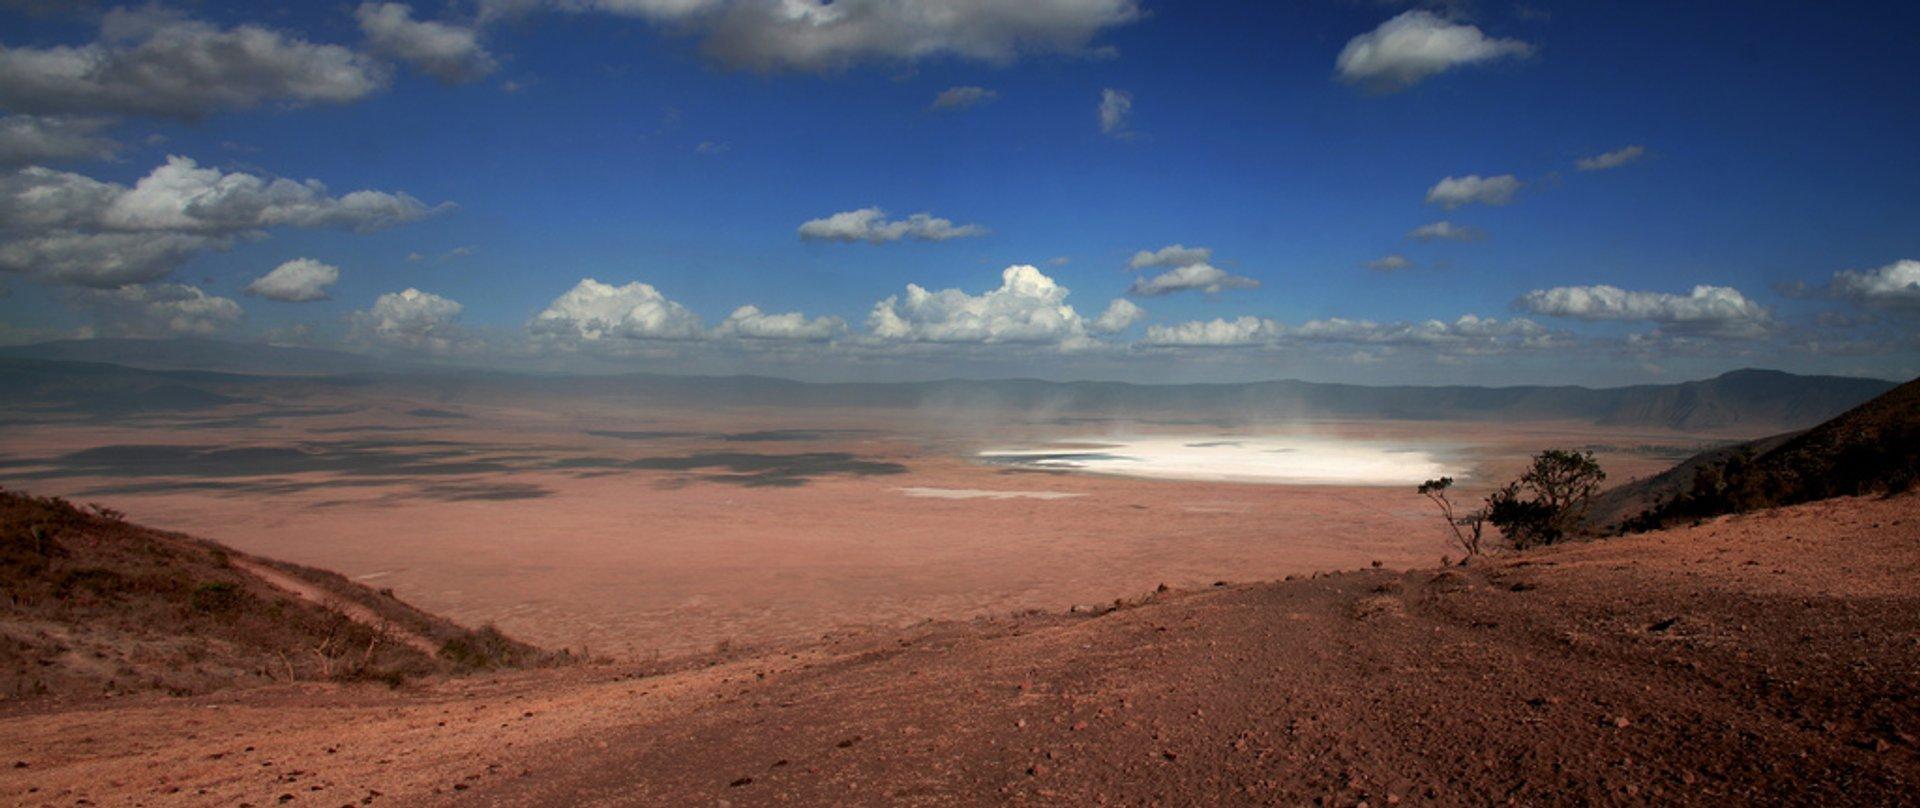 Ngorongoro Crater in Tanzania - Best Season 2020